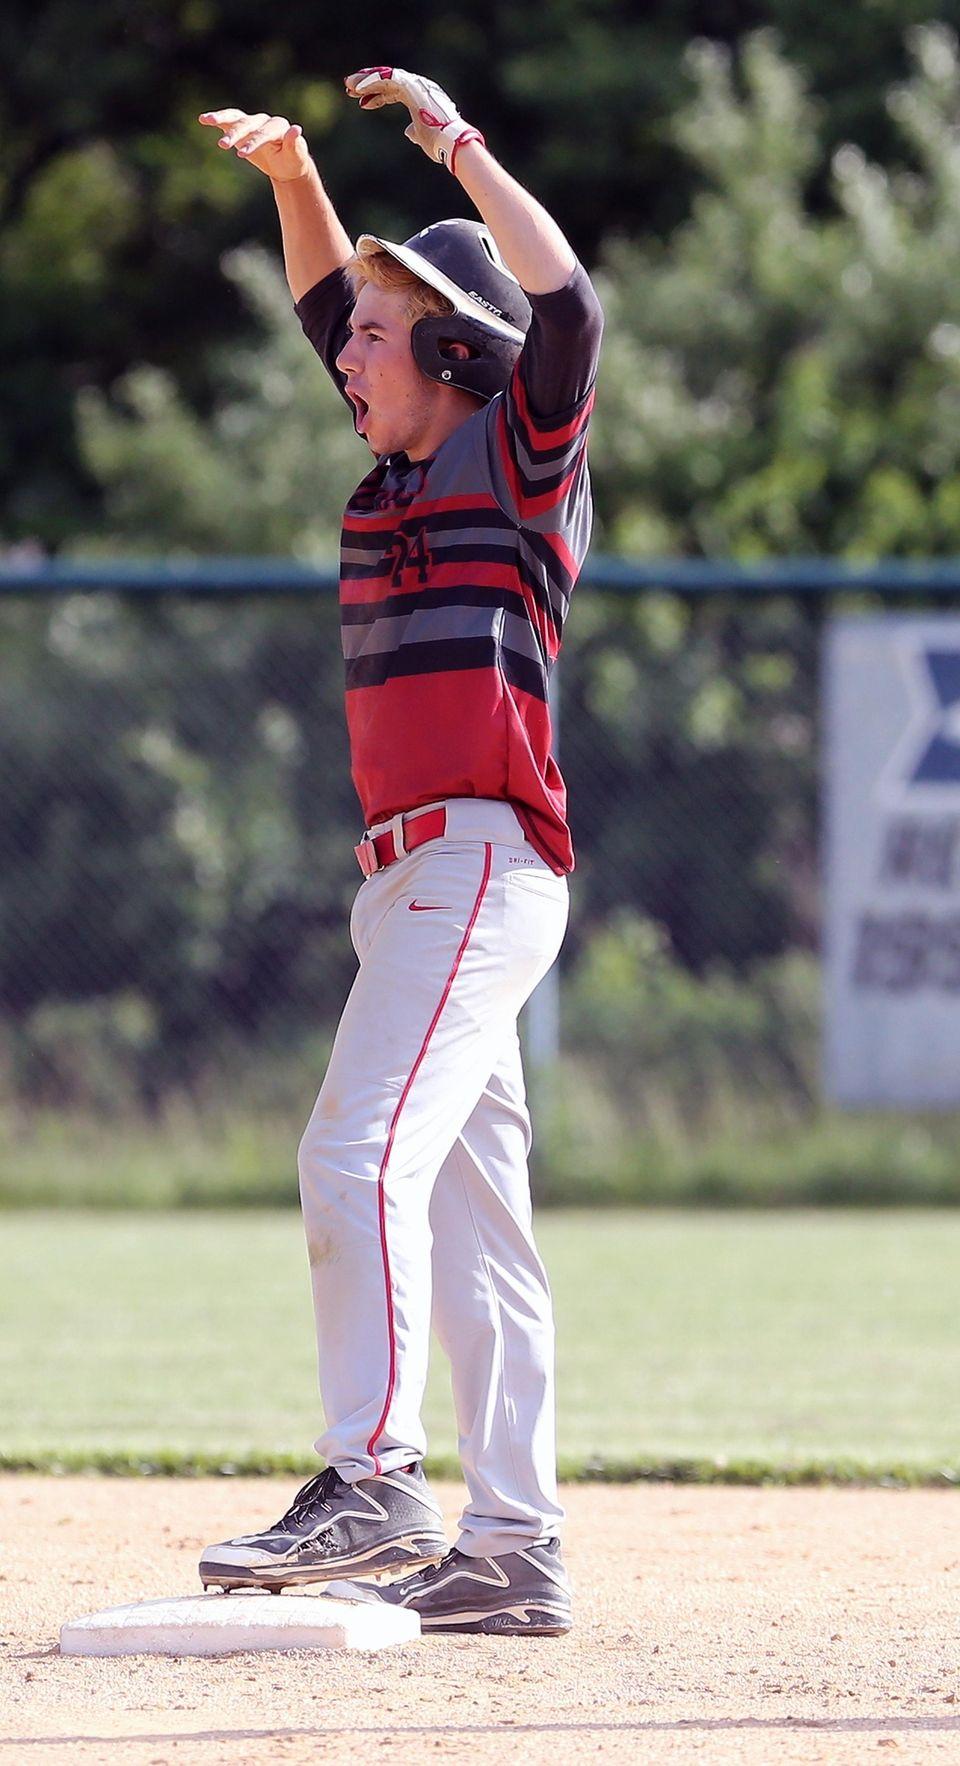 Southold's Pat McFarland celebrates on second base after